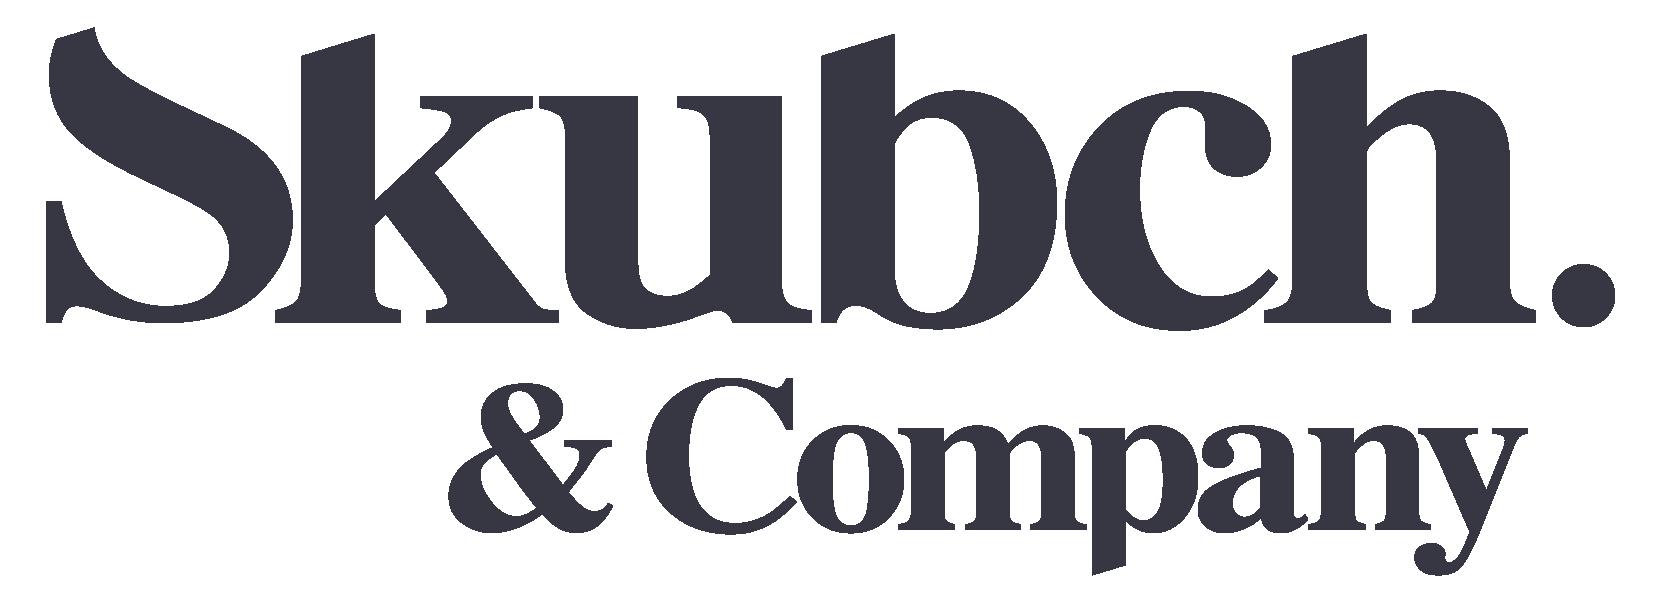 Skubch&Company